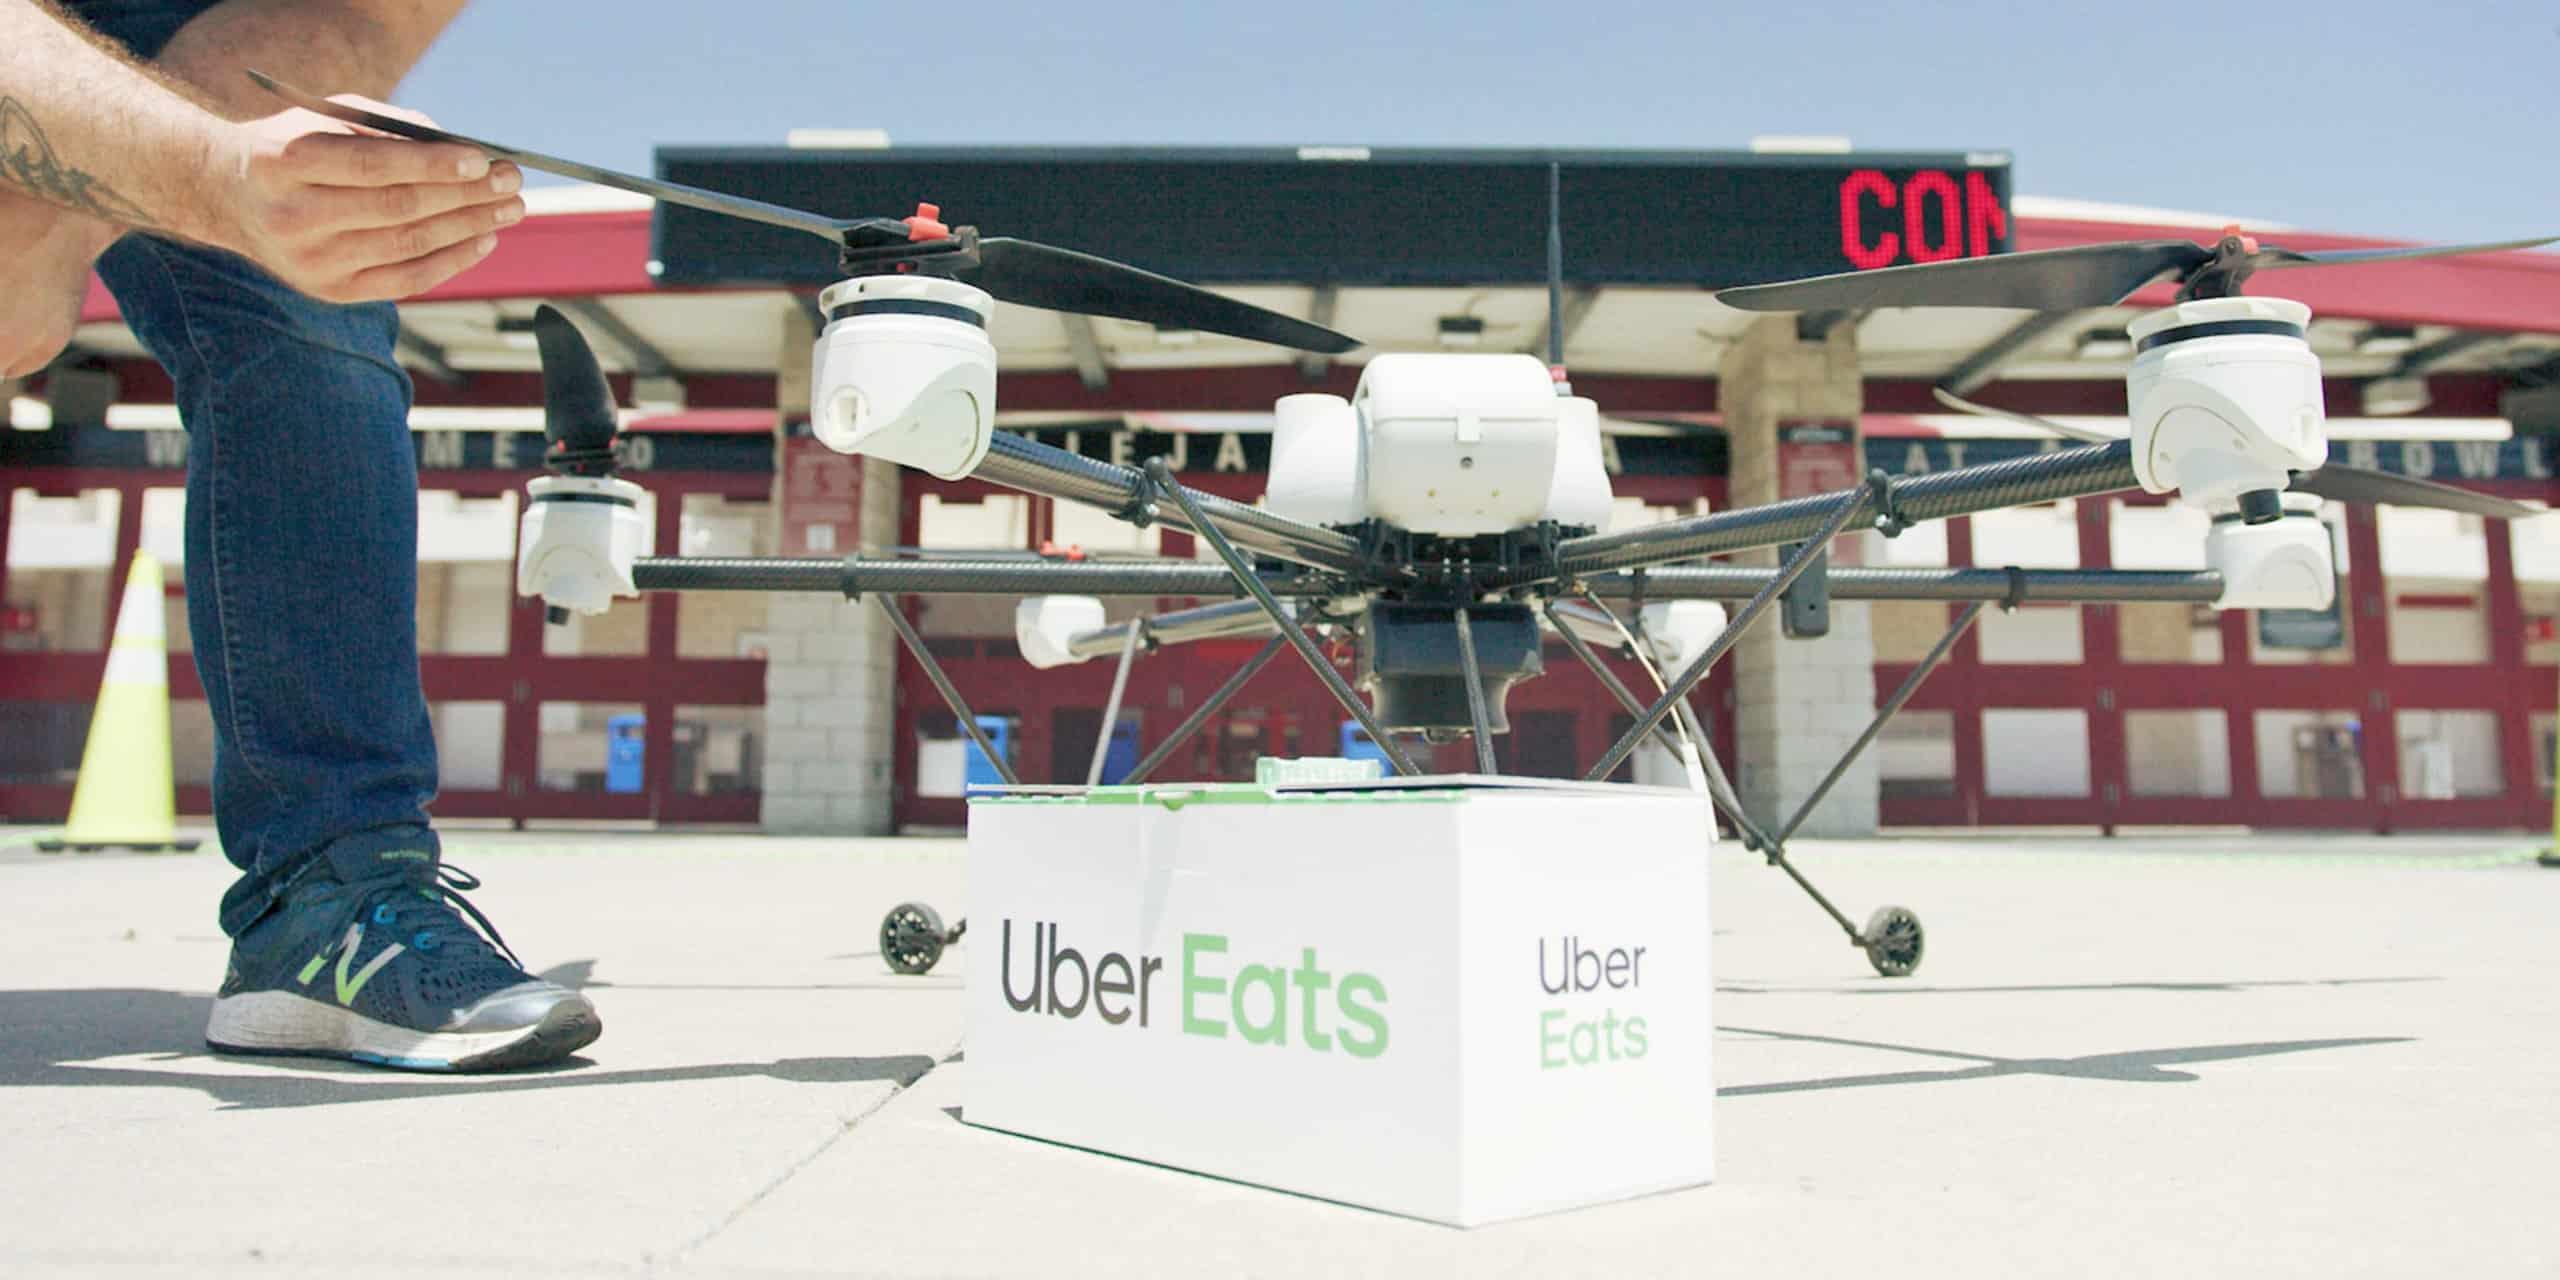 Uber Drones Meals Header Image